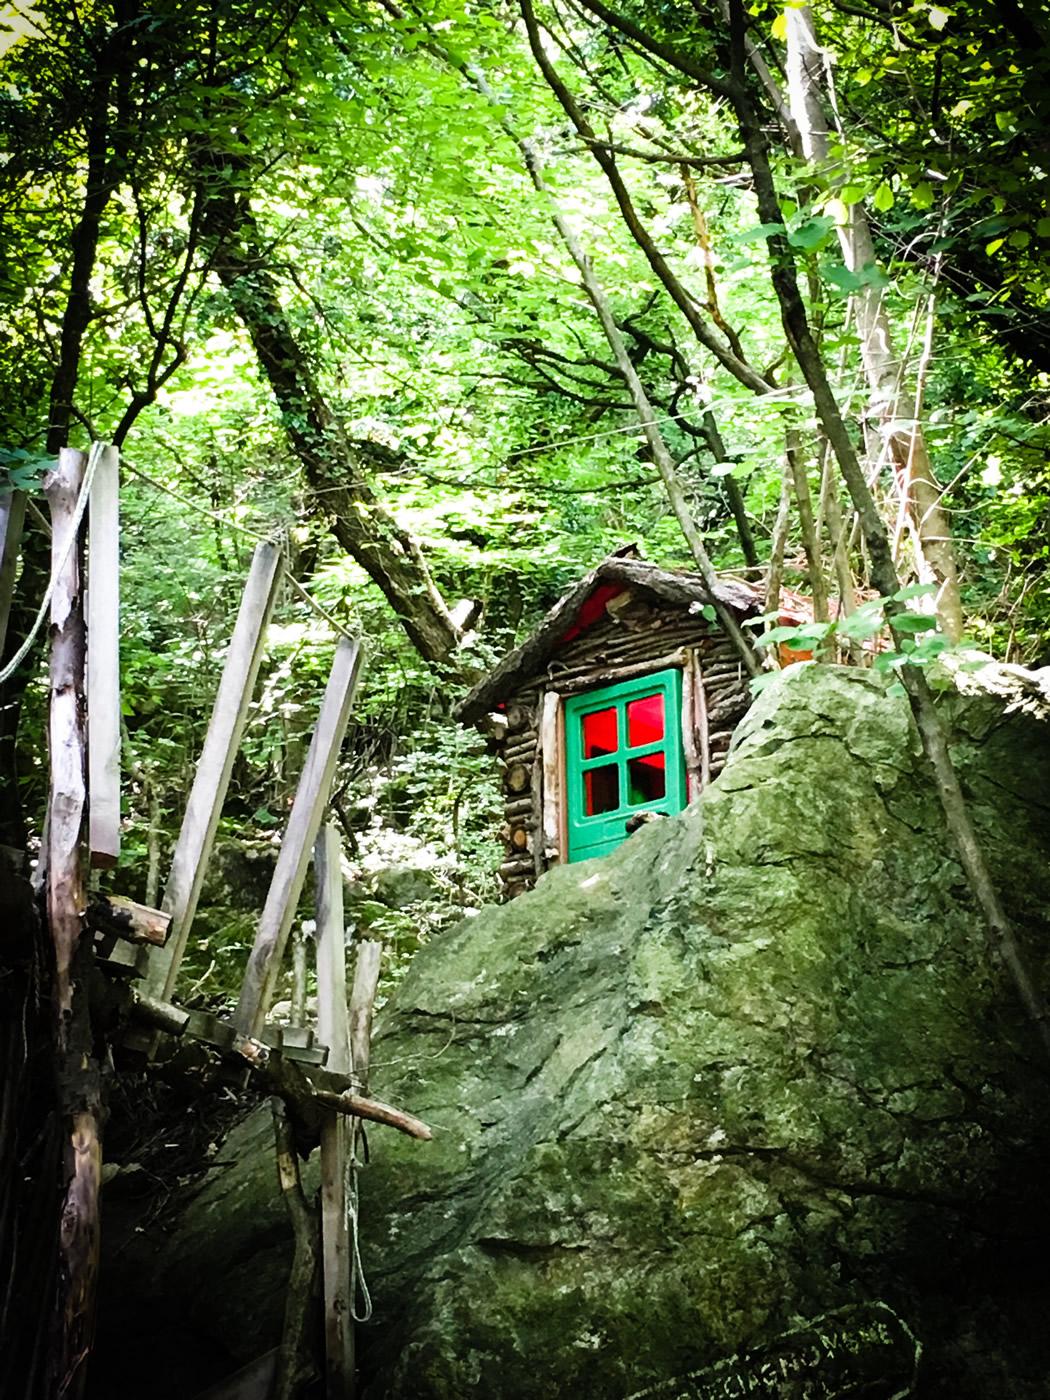 bosco delle meraviglie torino bnb 83 - 9